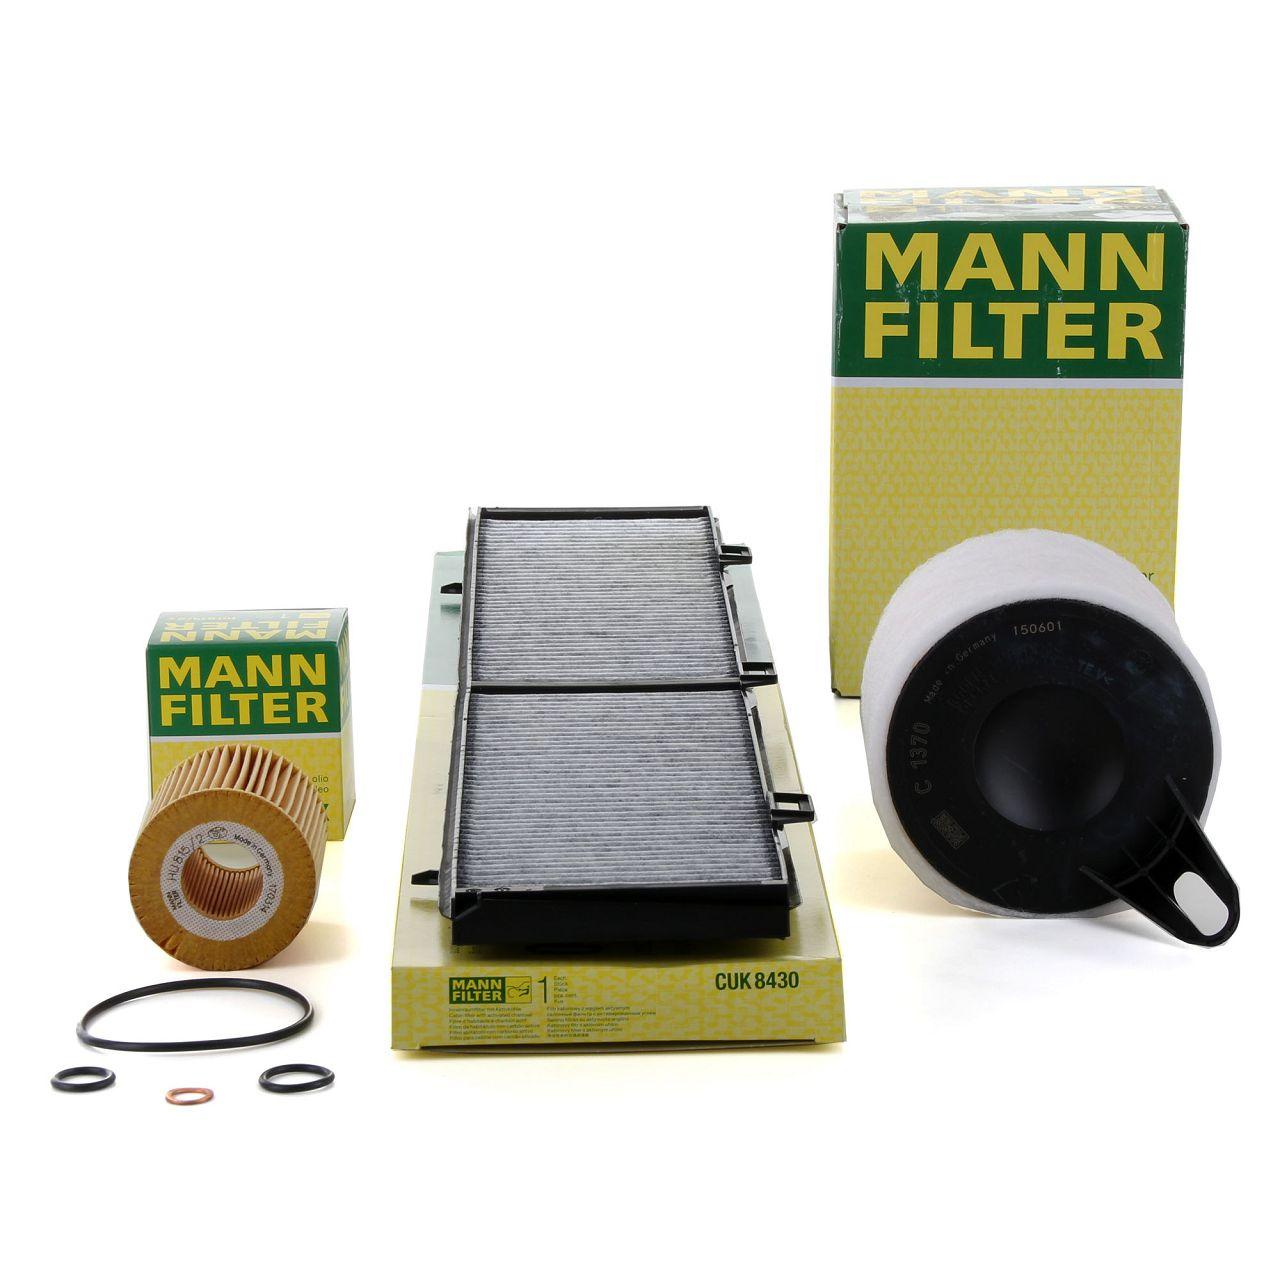 MANN Filterset für BMW 1er E81 E87 116i 3er E90 E91 E92 316i 115 / 121 / 122 PS